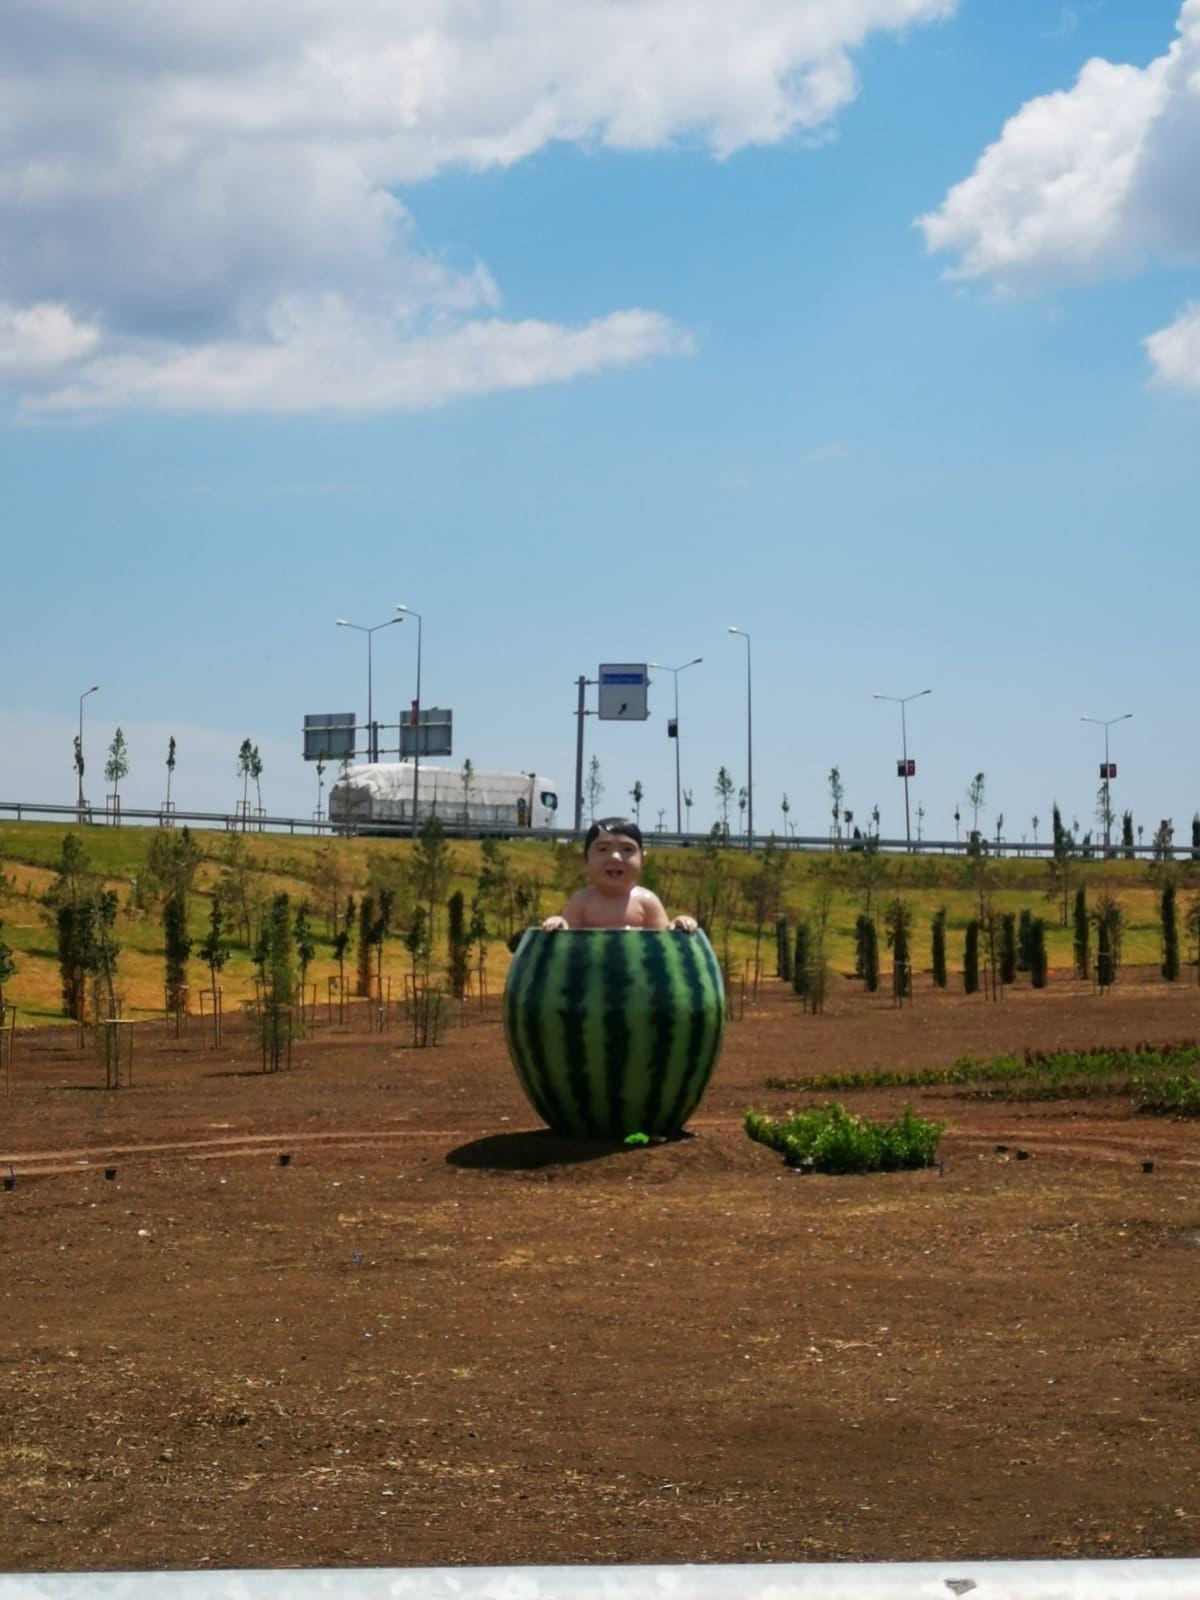 Watermelon baby statue in Diyarbakır joins Turkey's bizarre artworks - Page 1